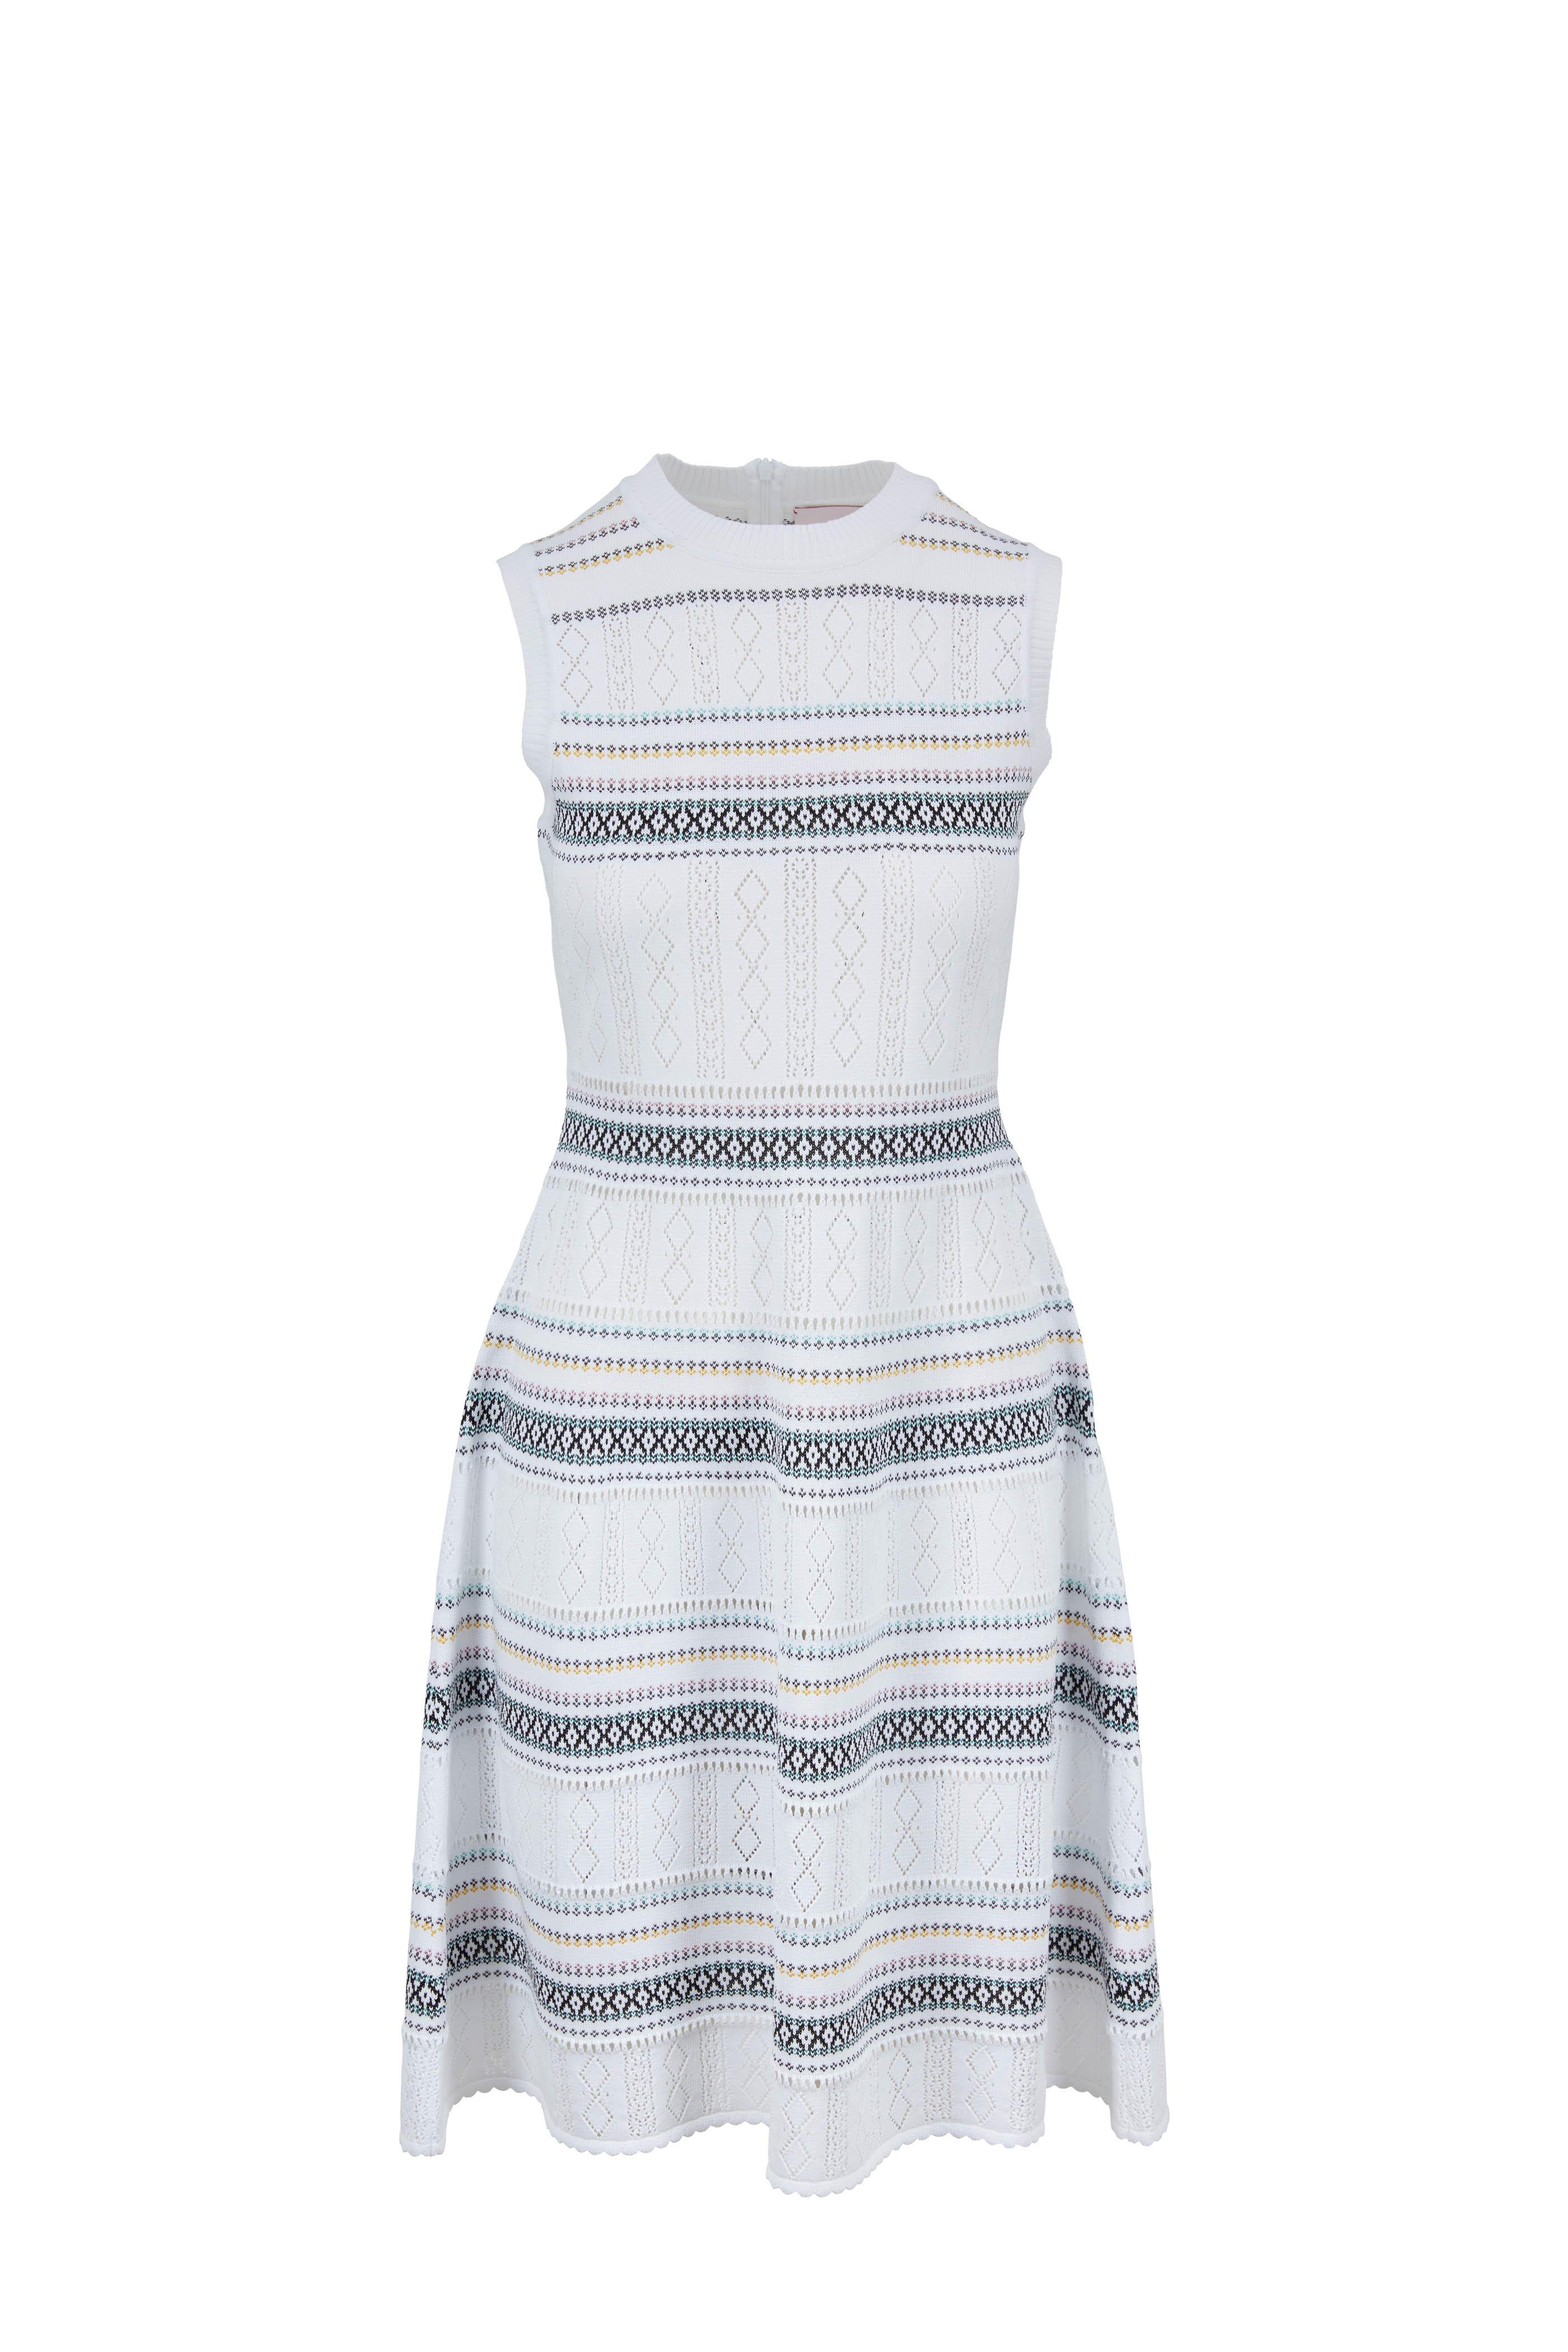 12a37c8bb2278 Carolina Herrera - White & Multicolor Stripe Knit Sleeveless Dress ...